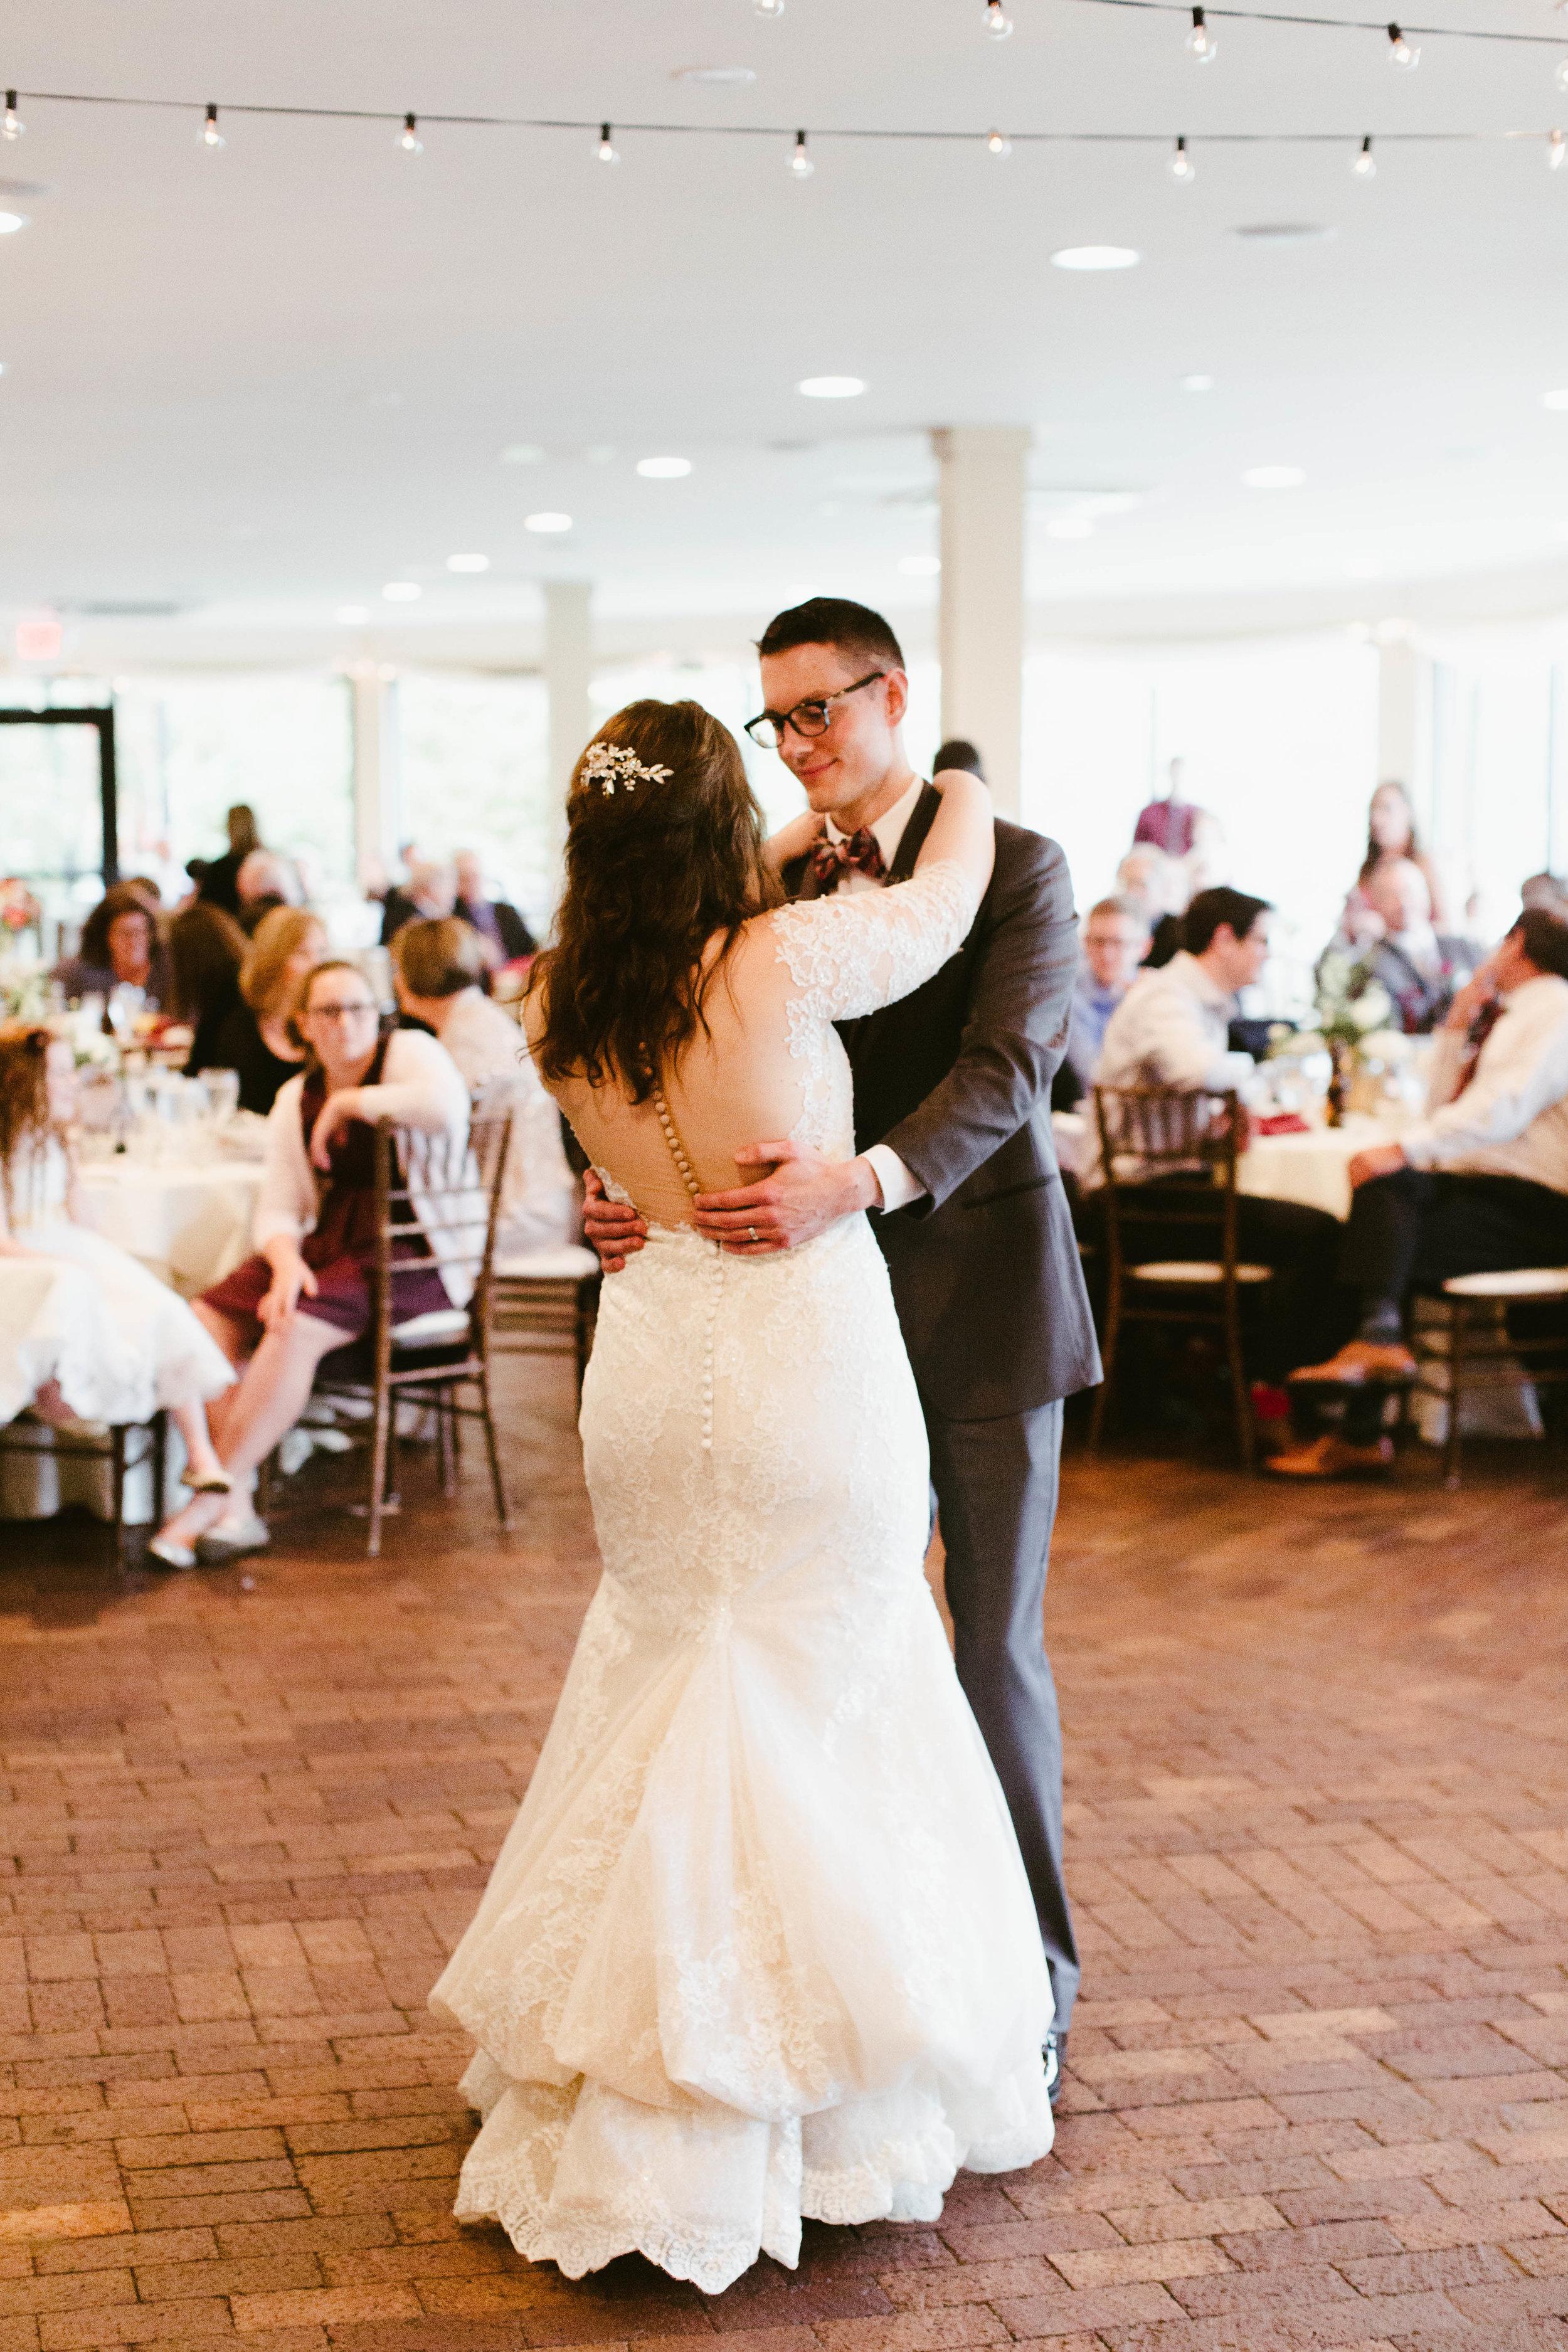 jennahazelphotography-marcy+ben-wedding-0455.jpg